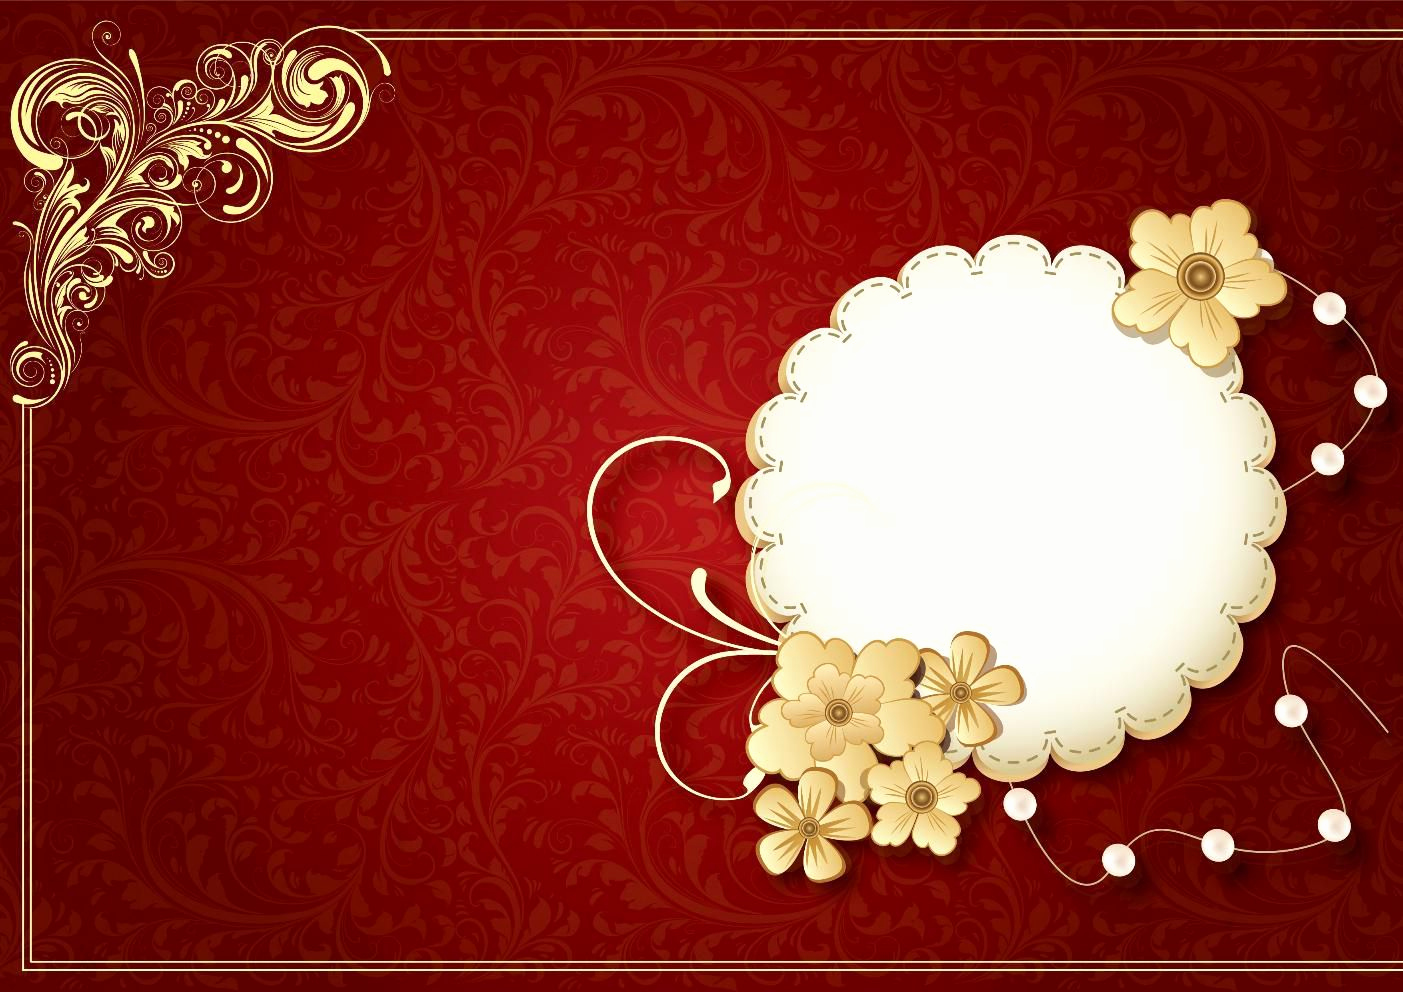 Wedding Invitation Background Designs Lovely Impressive Design Wedding Invitation Card Wedding